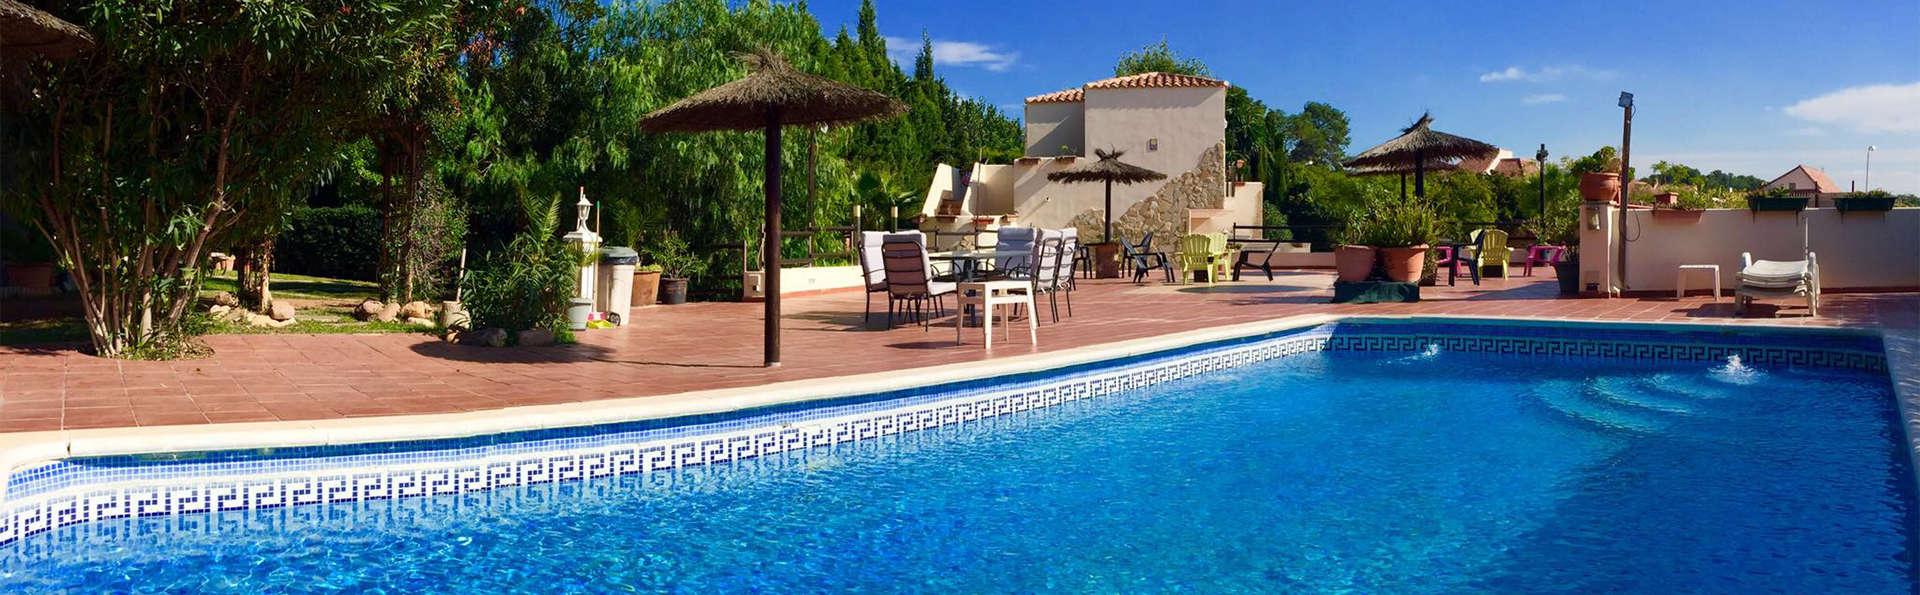 Hotel Cruz de Gracia - EDIT_pool2.jpg